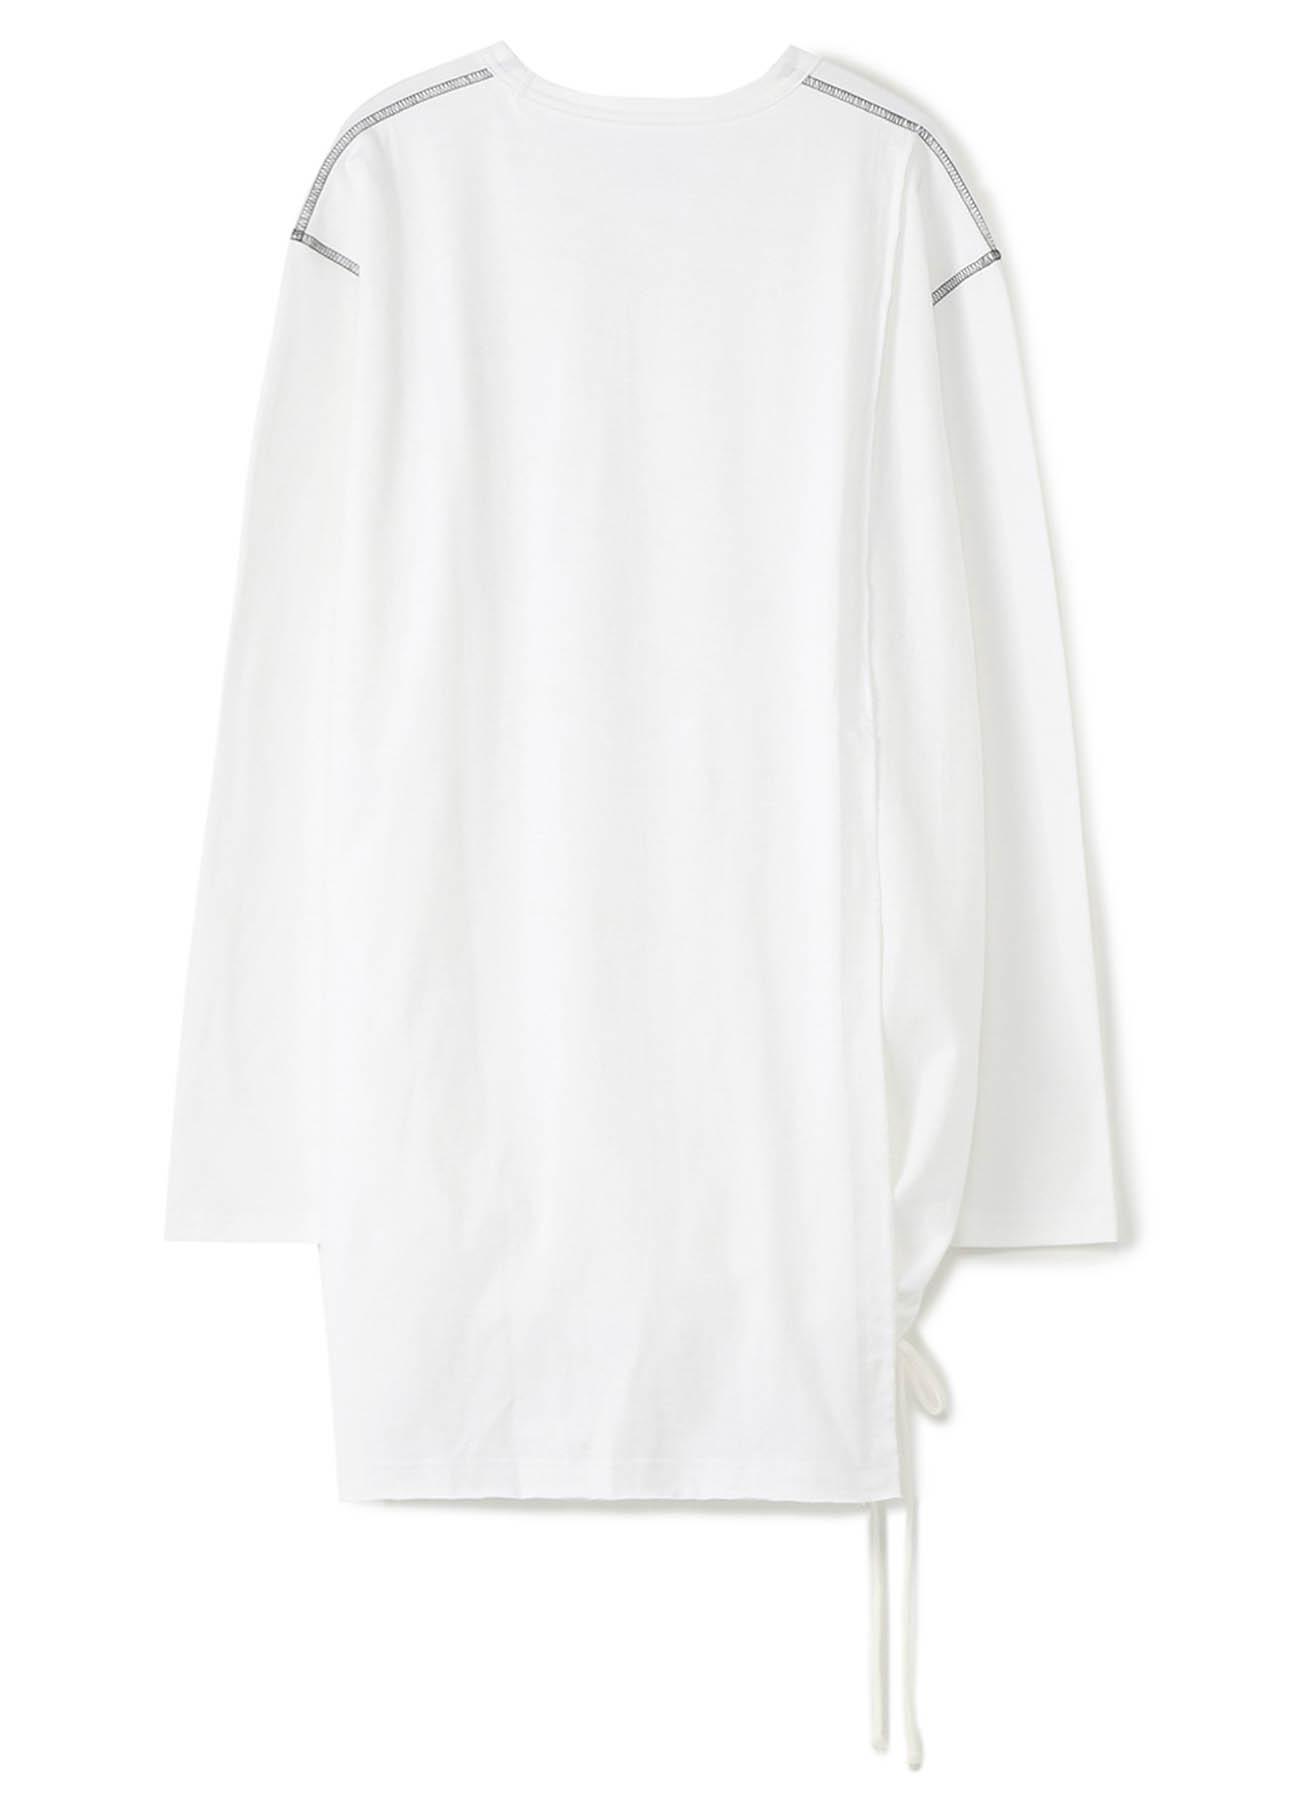 40/2 Cotton Jersey Crew Drawstring Back Half-Layered ColorLock Big T-Shirt